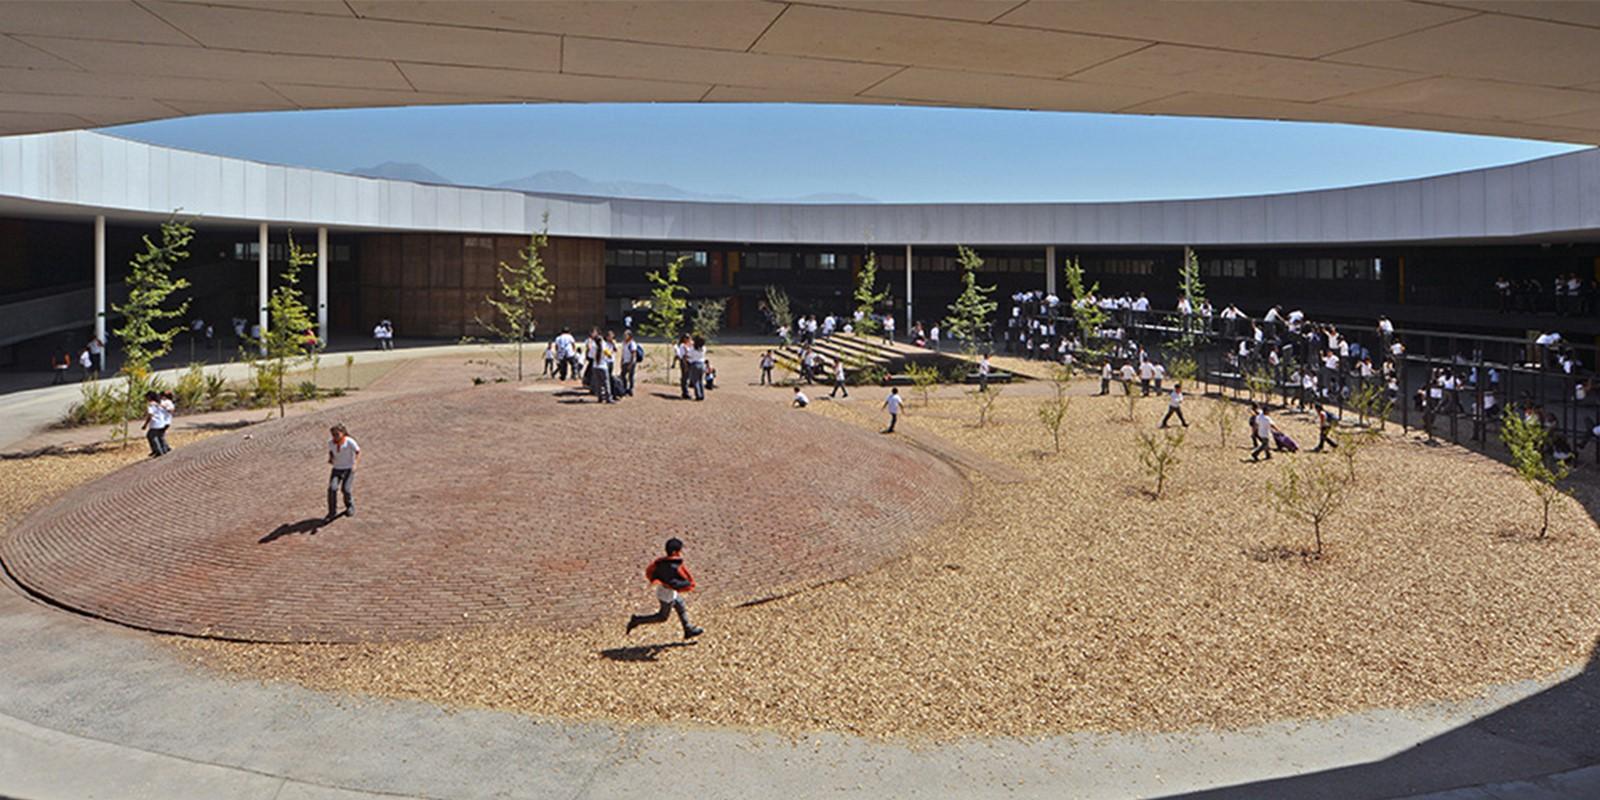 Ayelen School, Chile by Alejandro Aravena: Quality Education through Architecture Sheet5